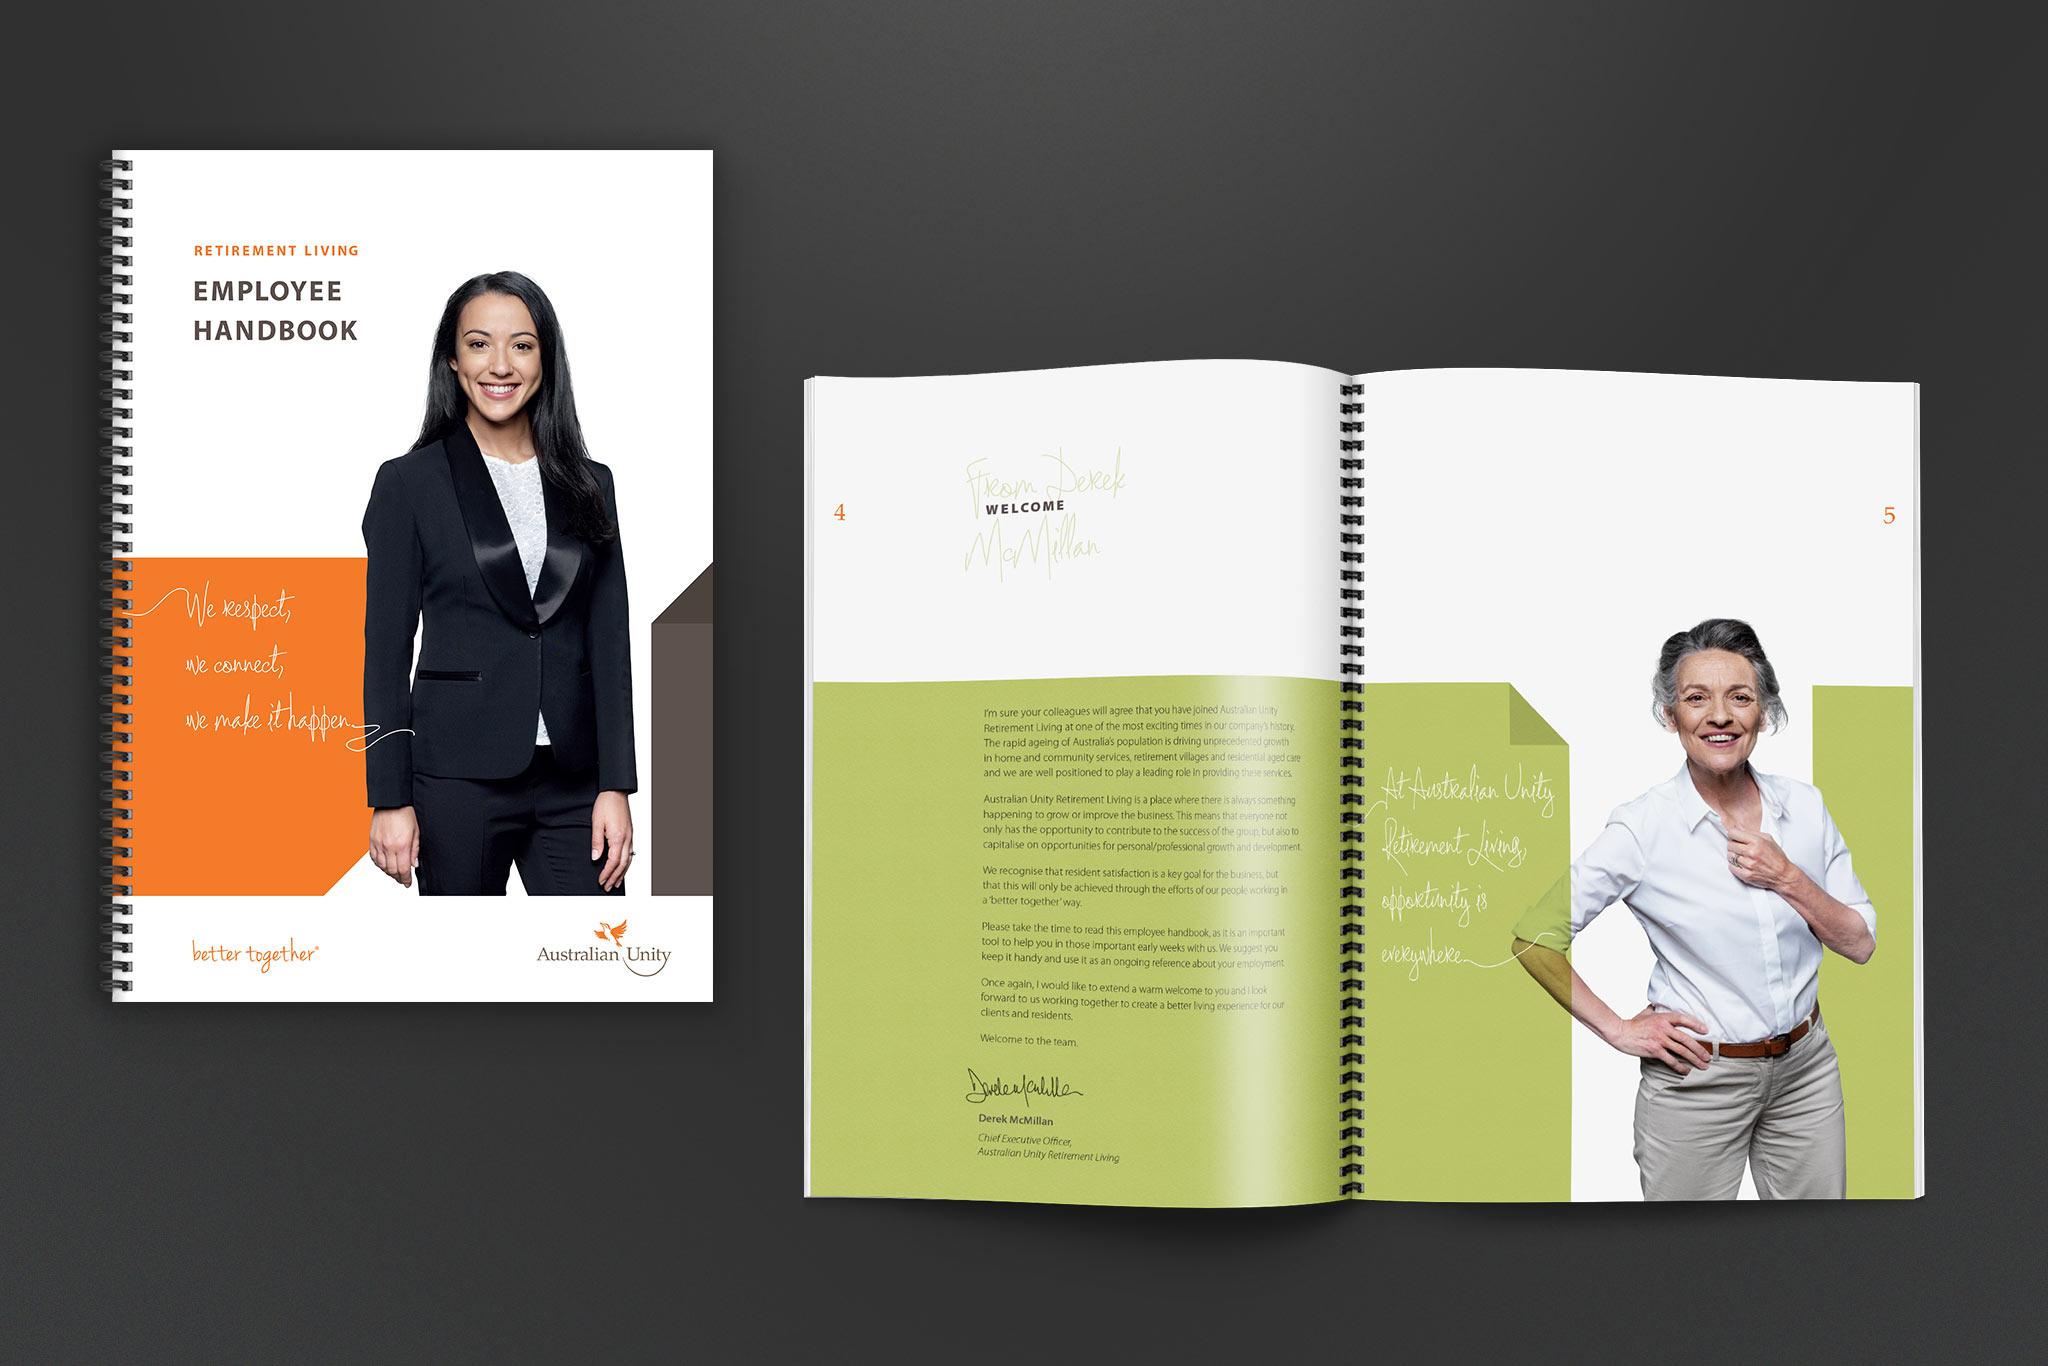 australian-unity-gallery-8-employee-handbook